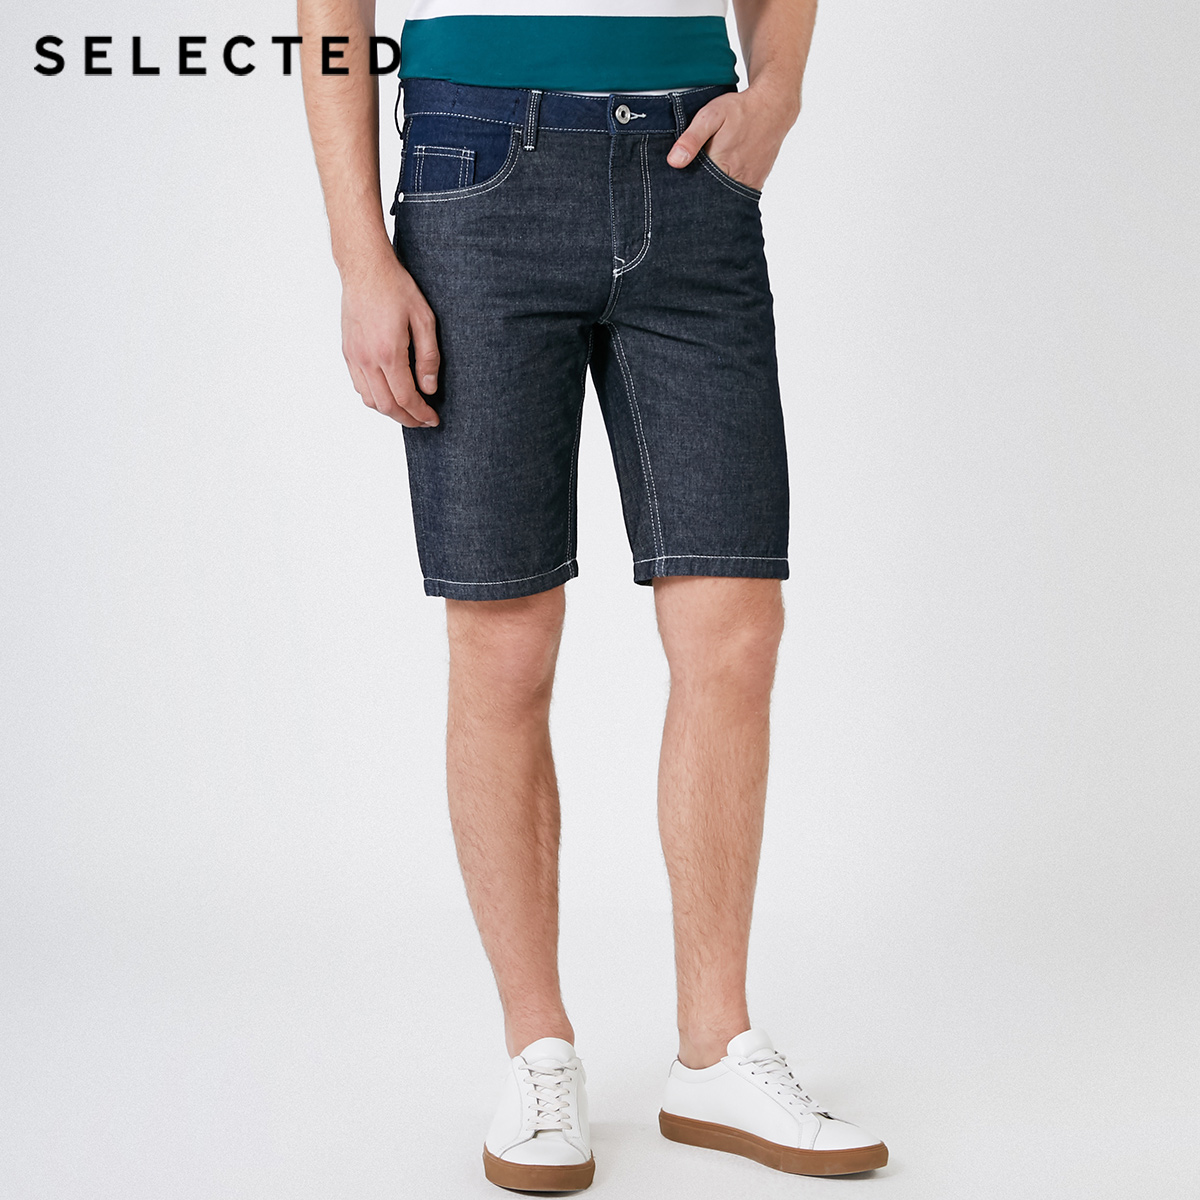 SELECTED Men's Summer Straight Fit Denim Shorts C|4192S3504